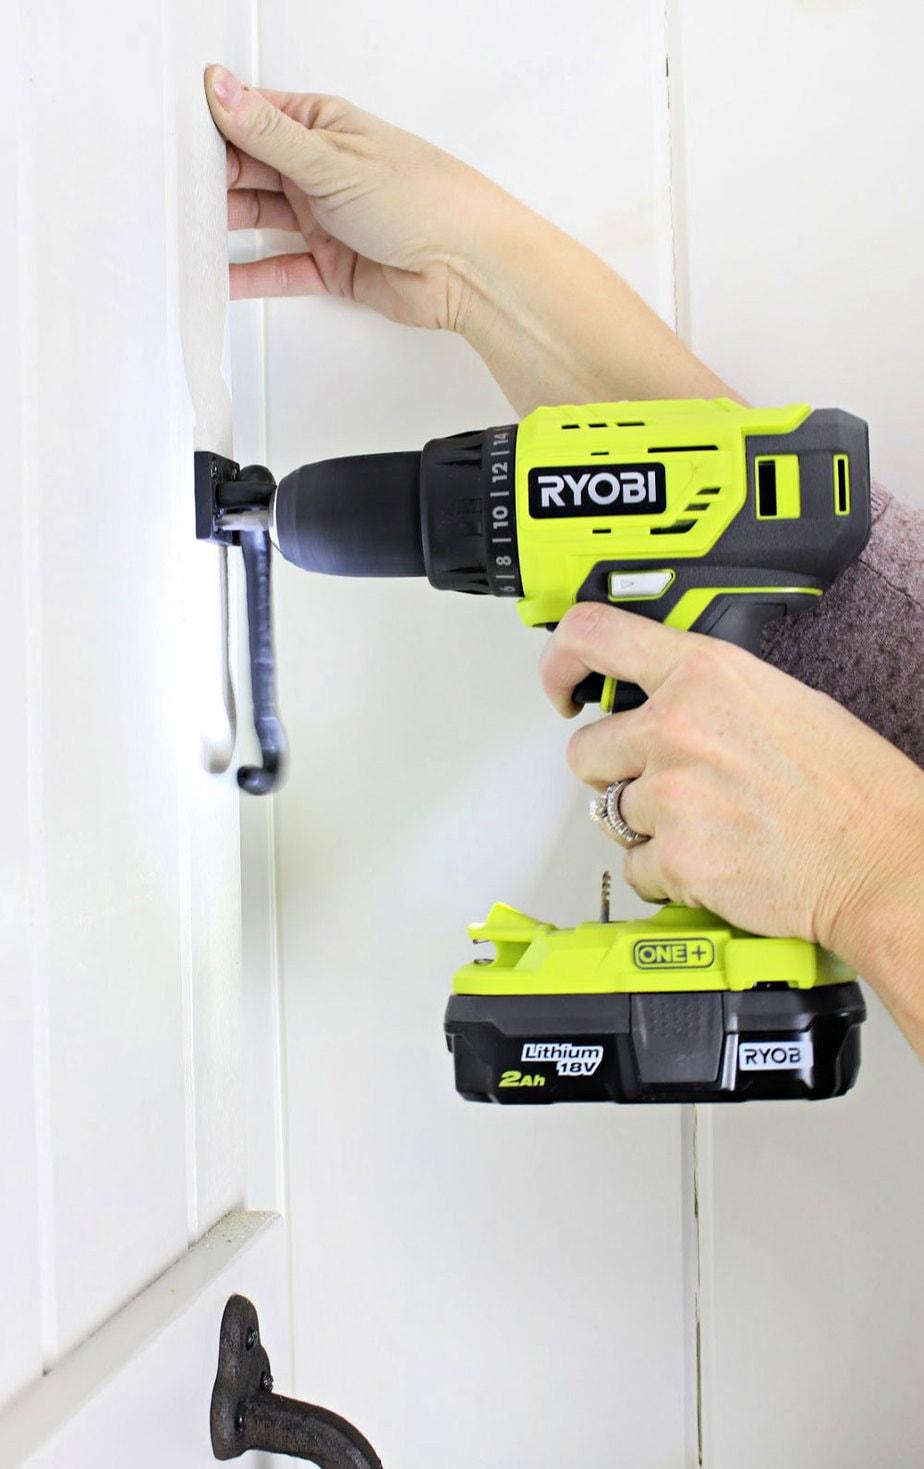 Ryobi drill installing screws